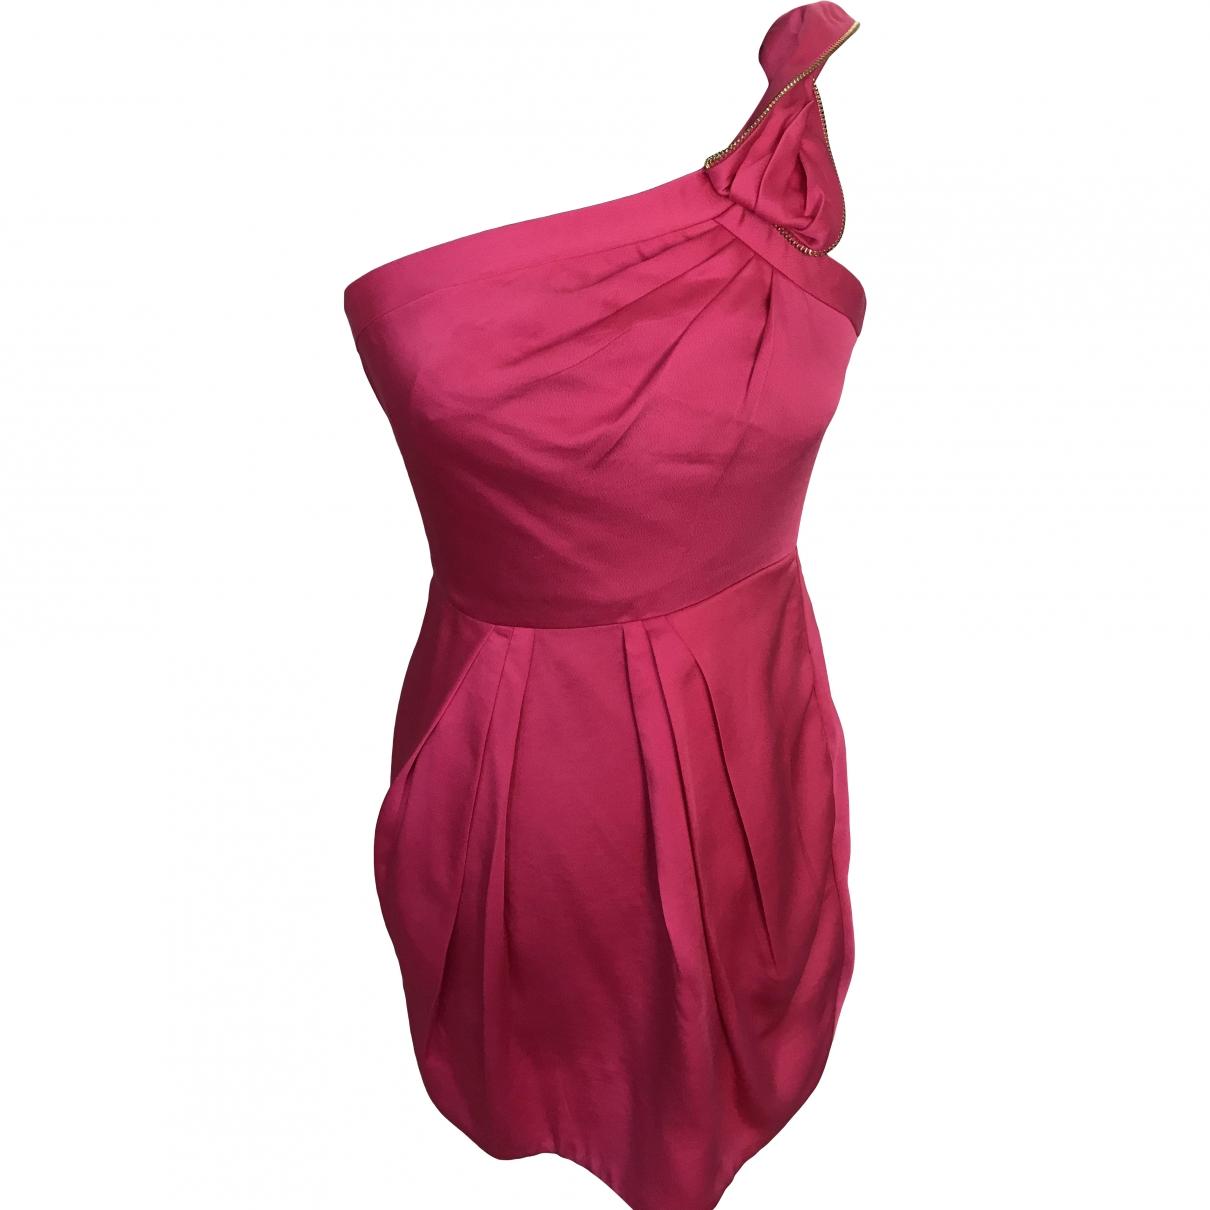 Bcbg Max Azria \N Pink dress for Women 0 0-5